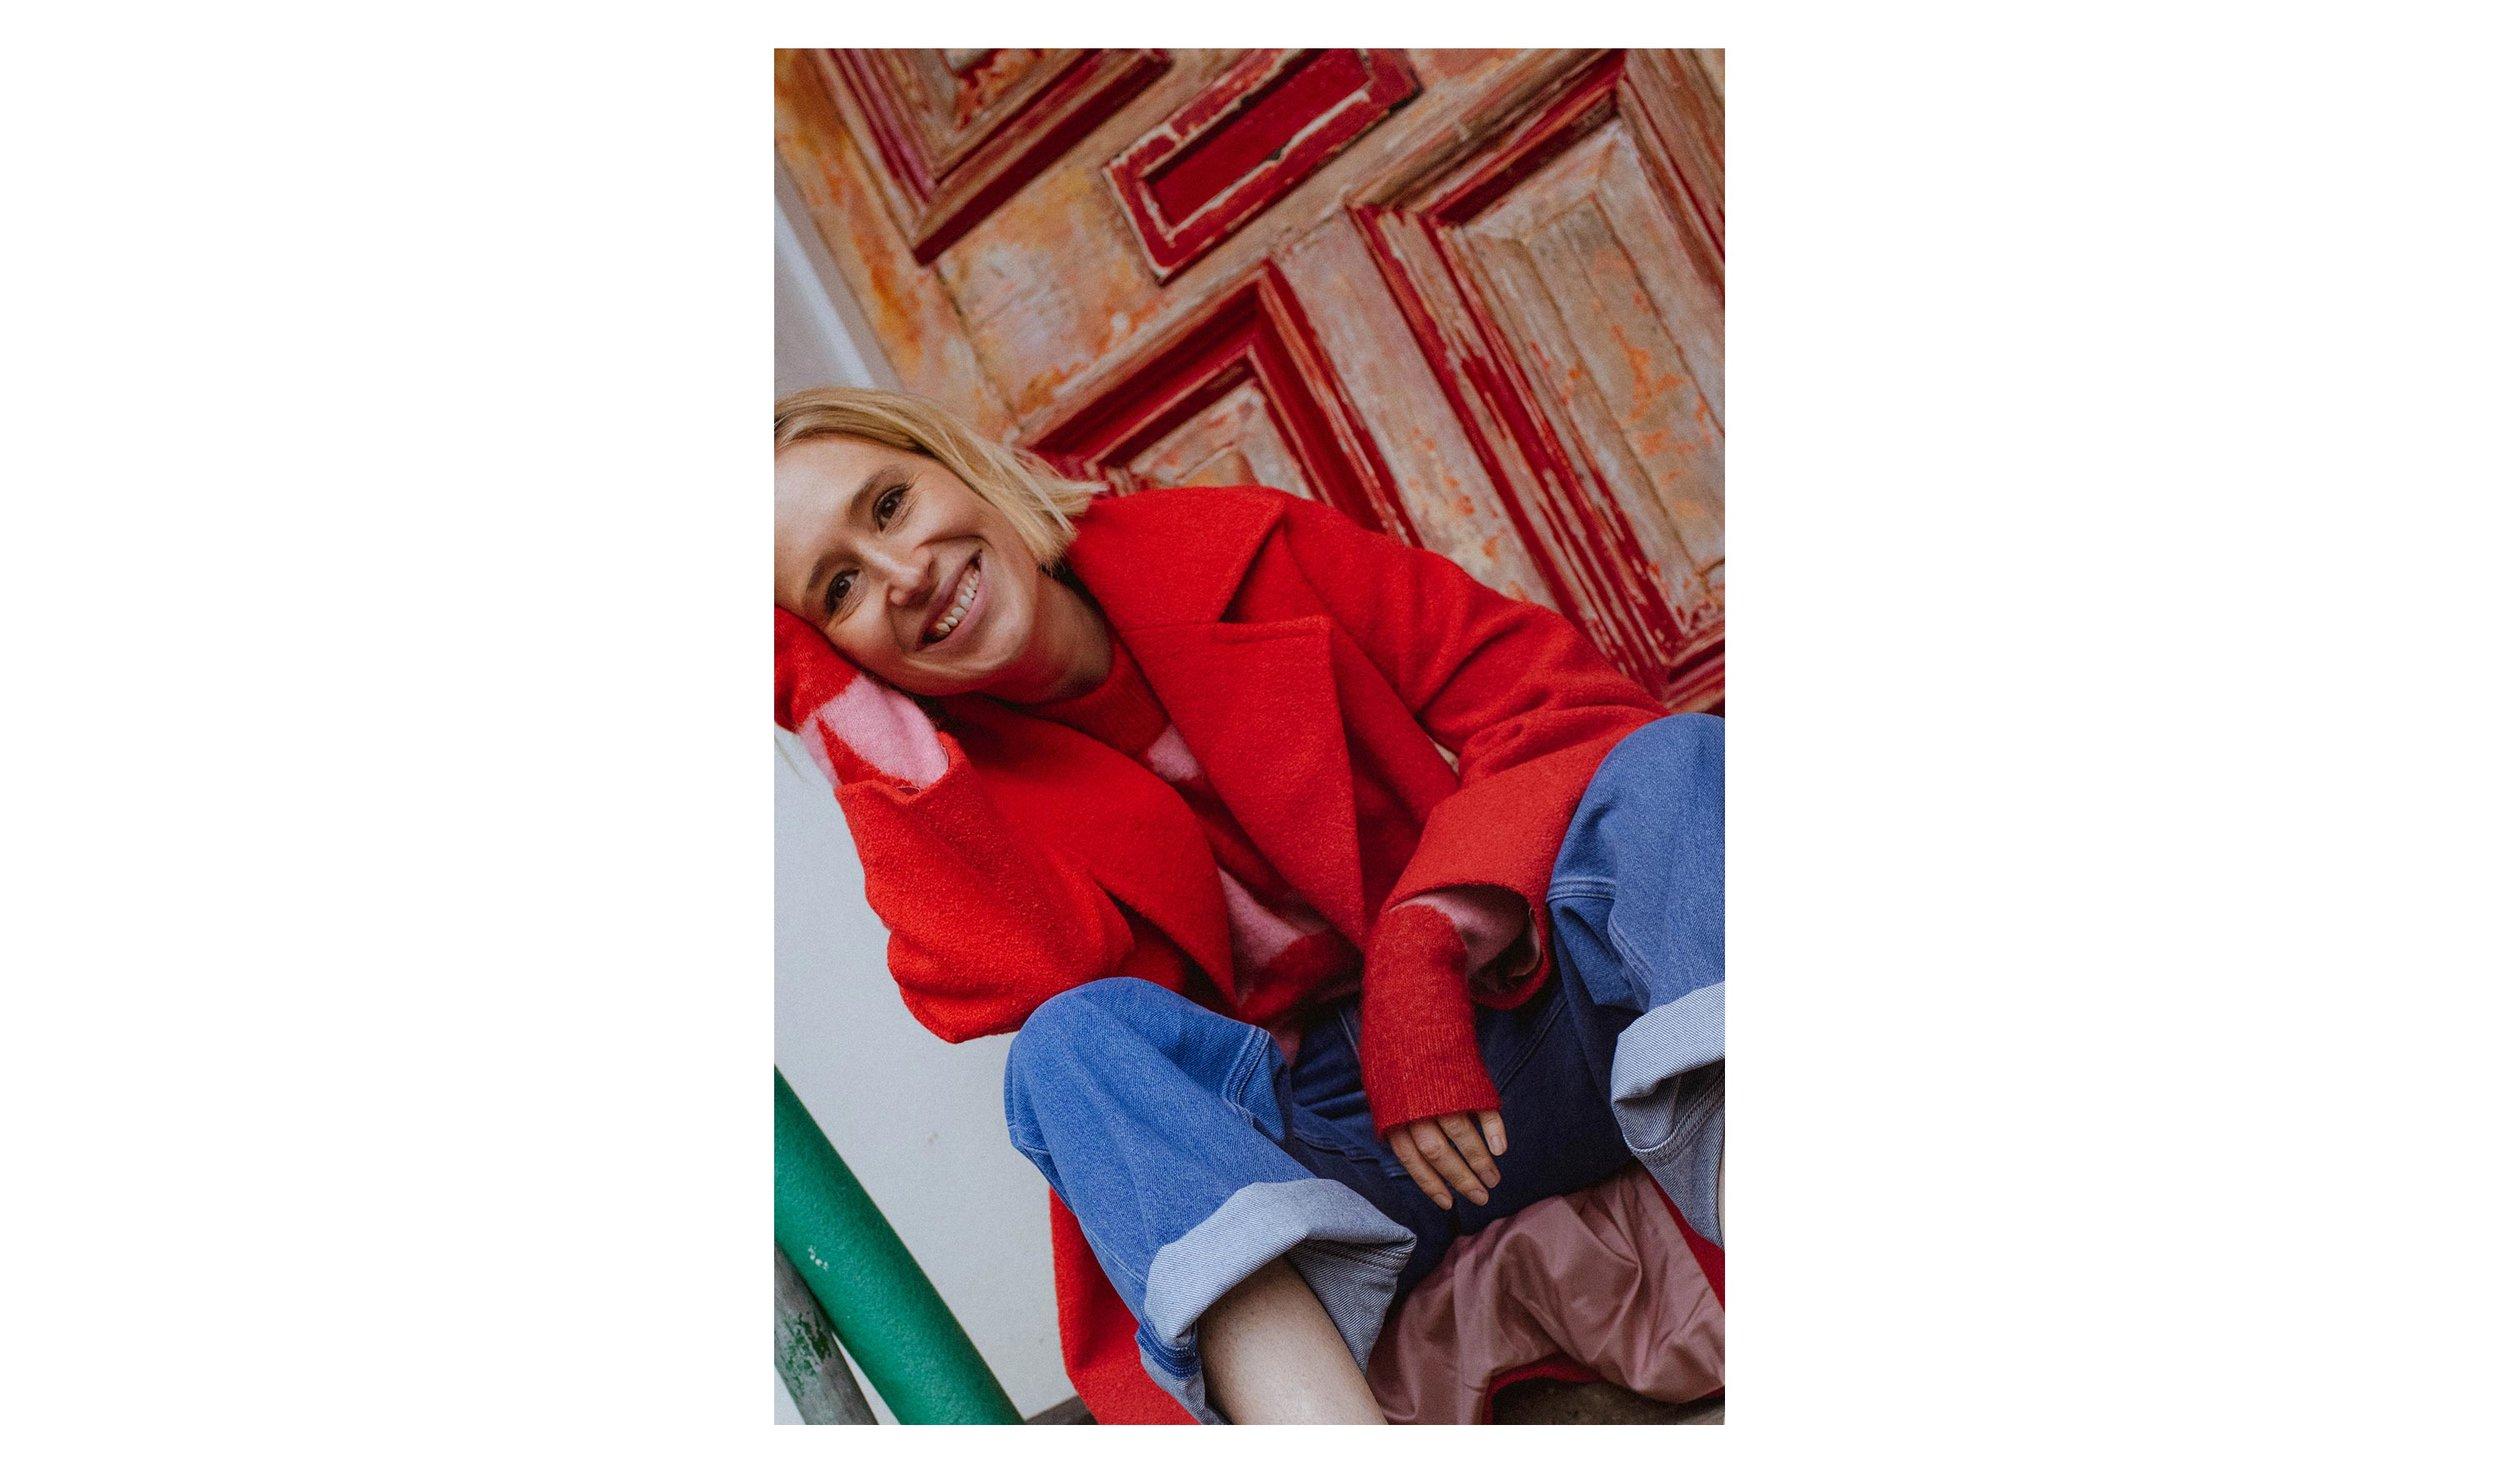 Red-coat-16.jpg